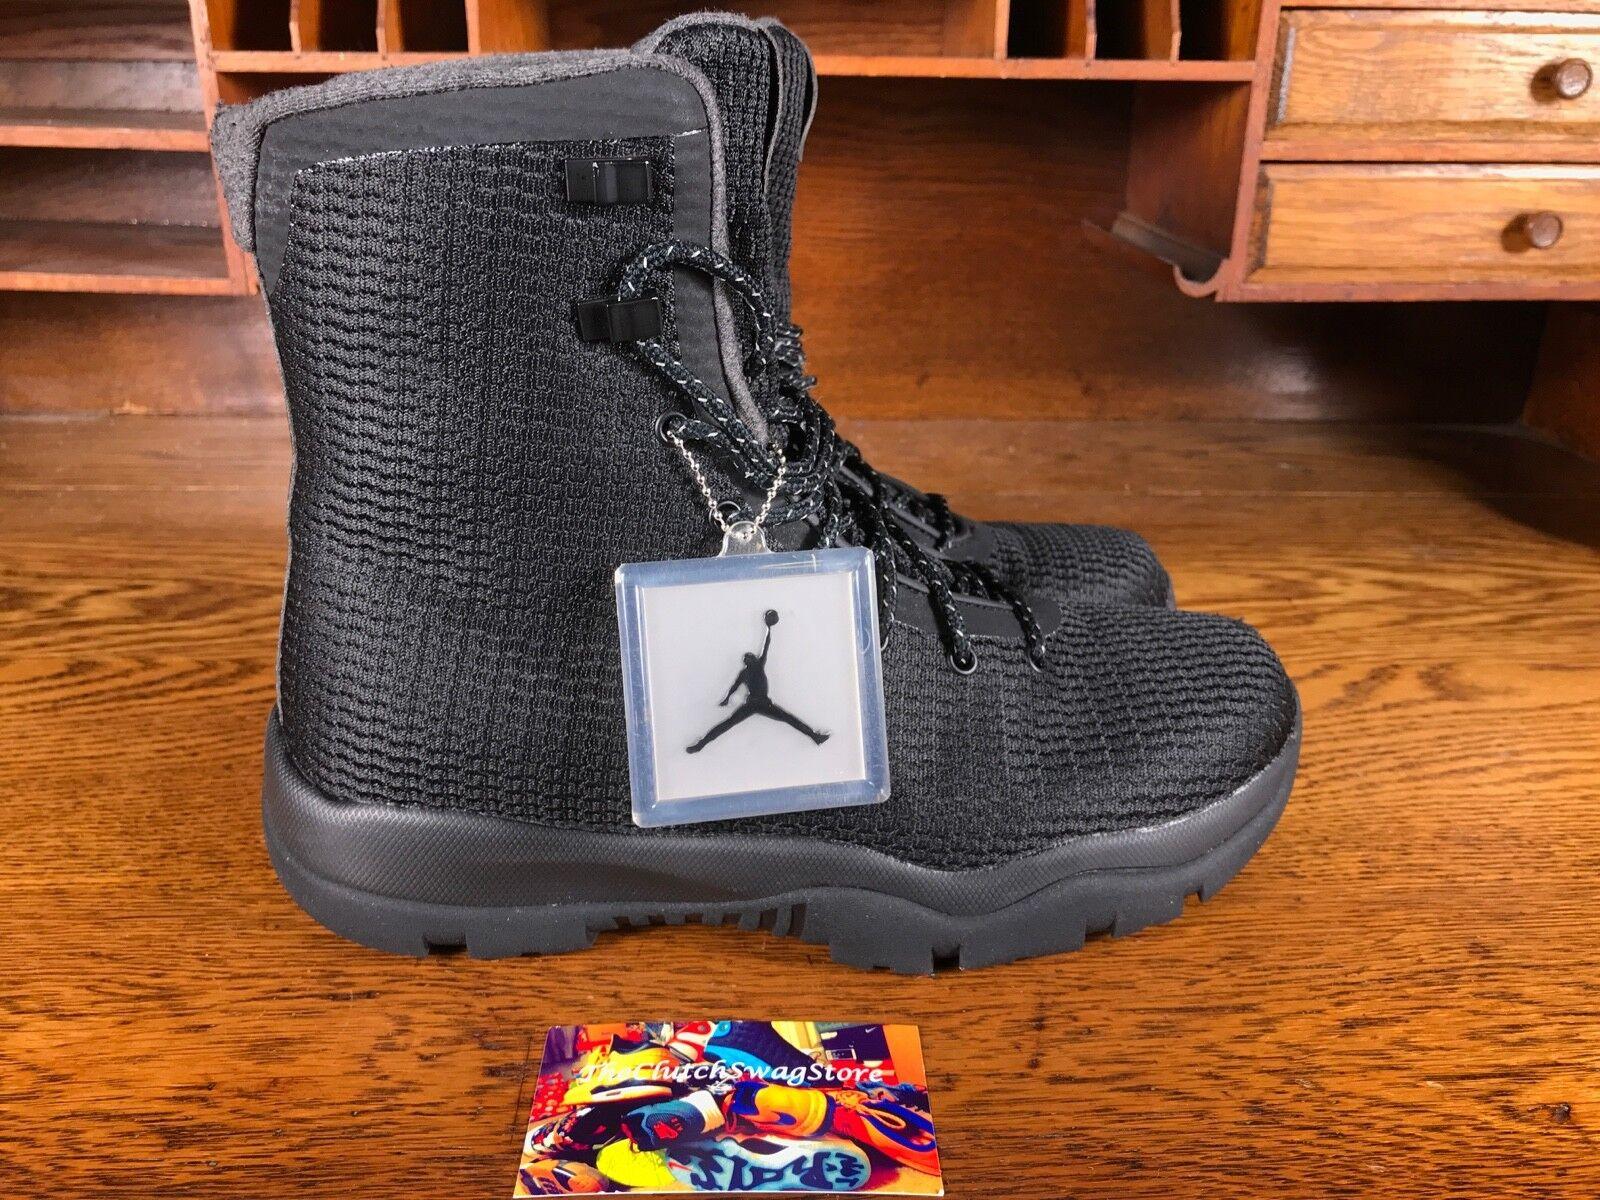 Nike Air Jordan Retro Future Men Snow Boot Black Grey Waterproof 854554-002 Sz 9